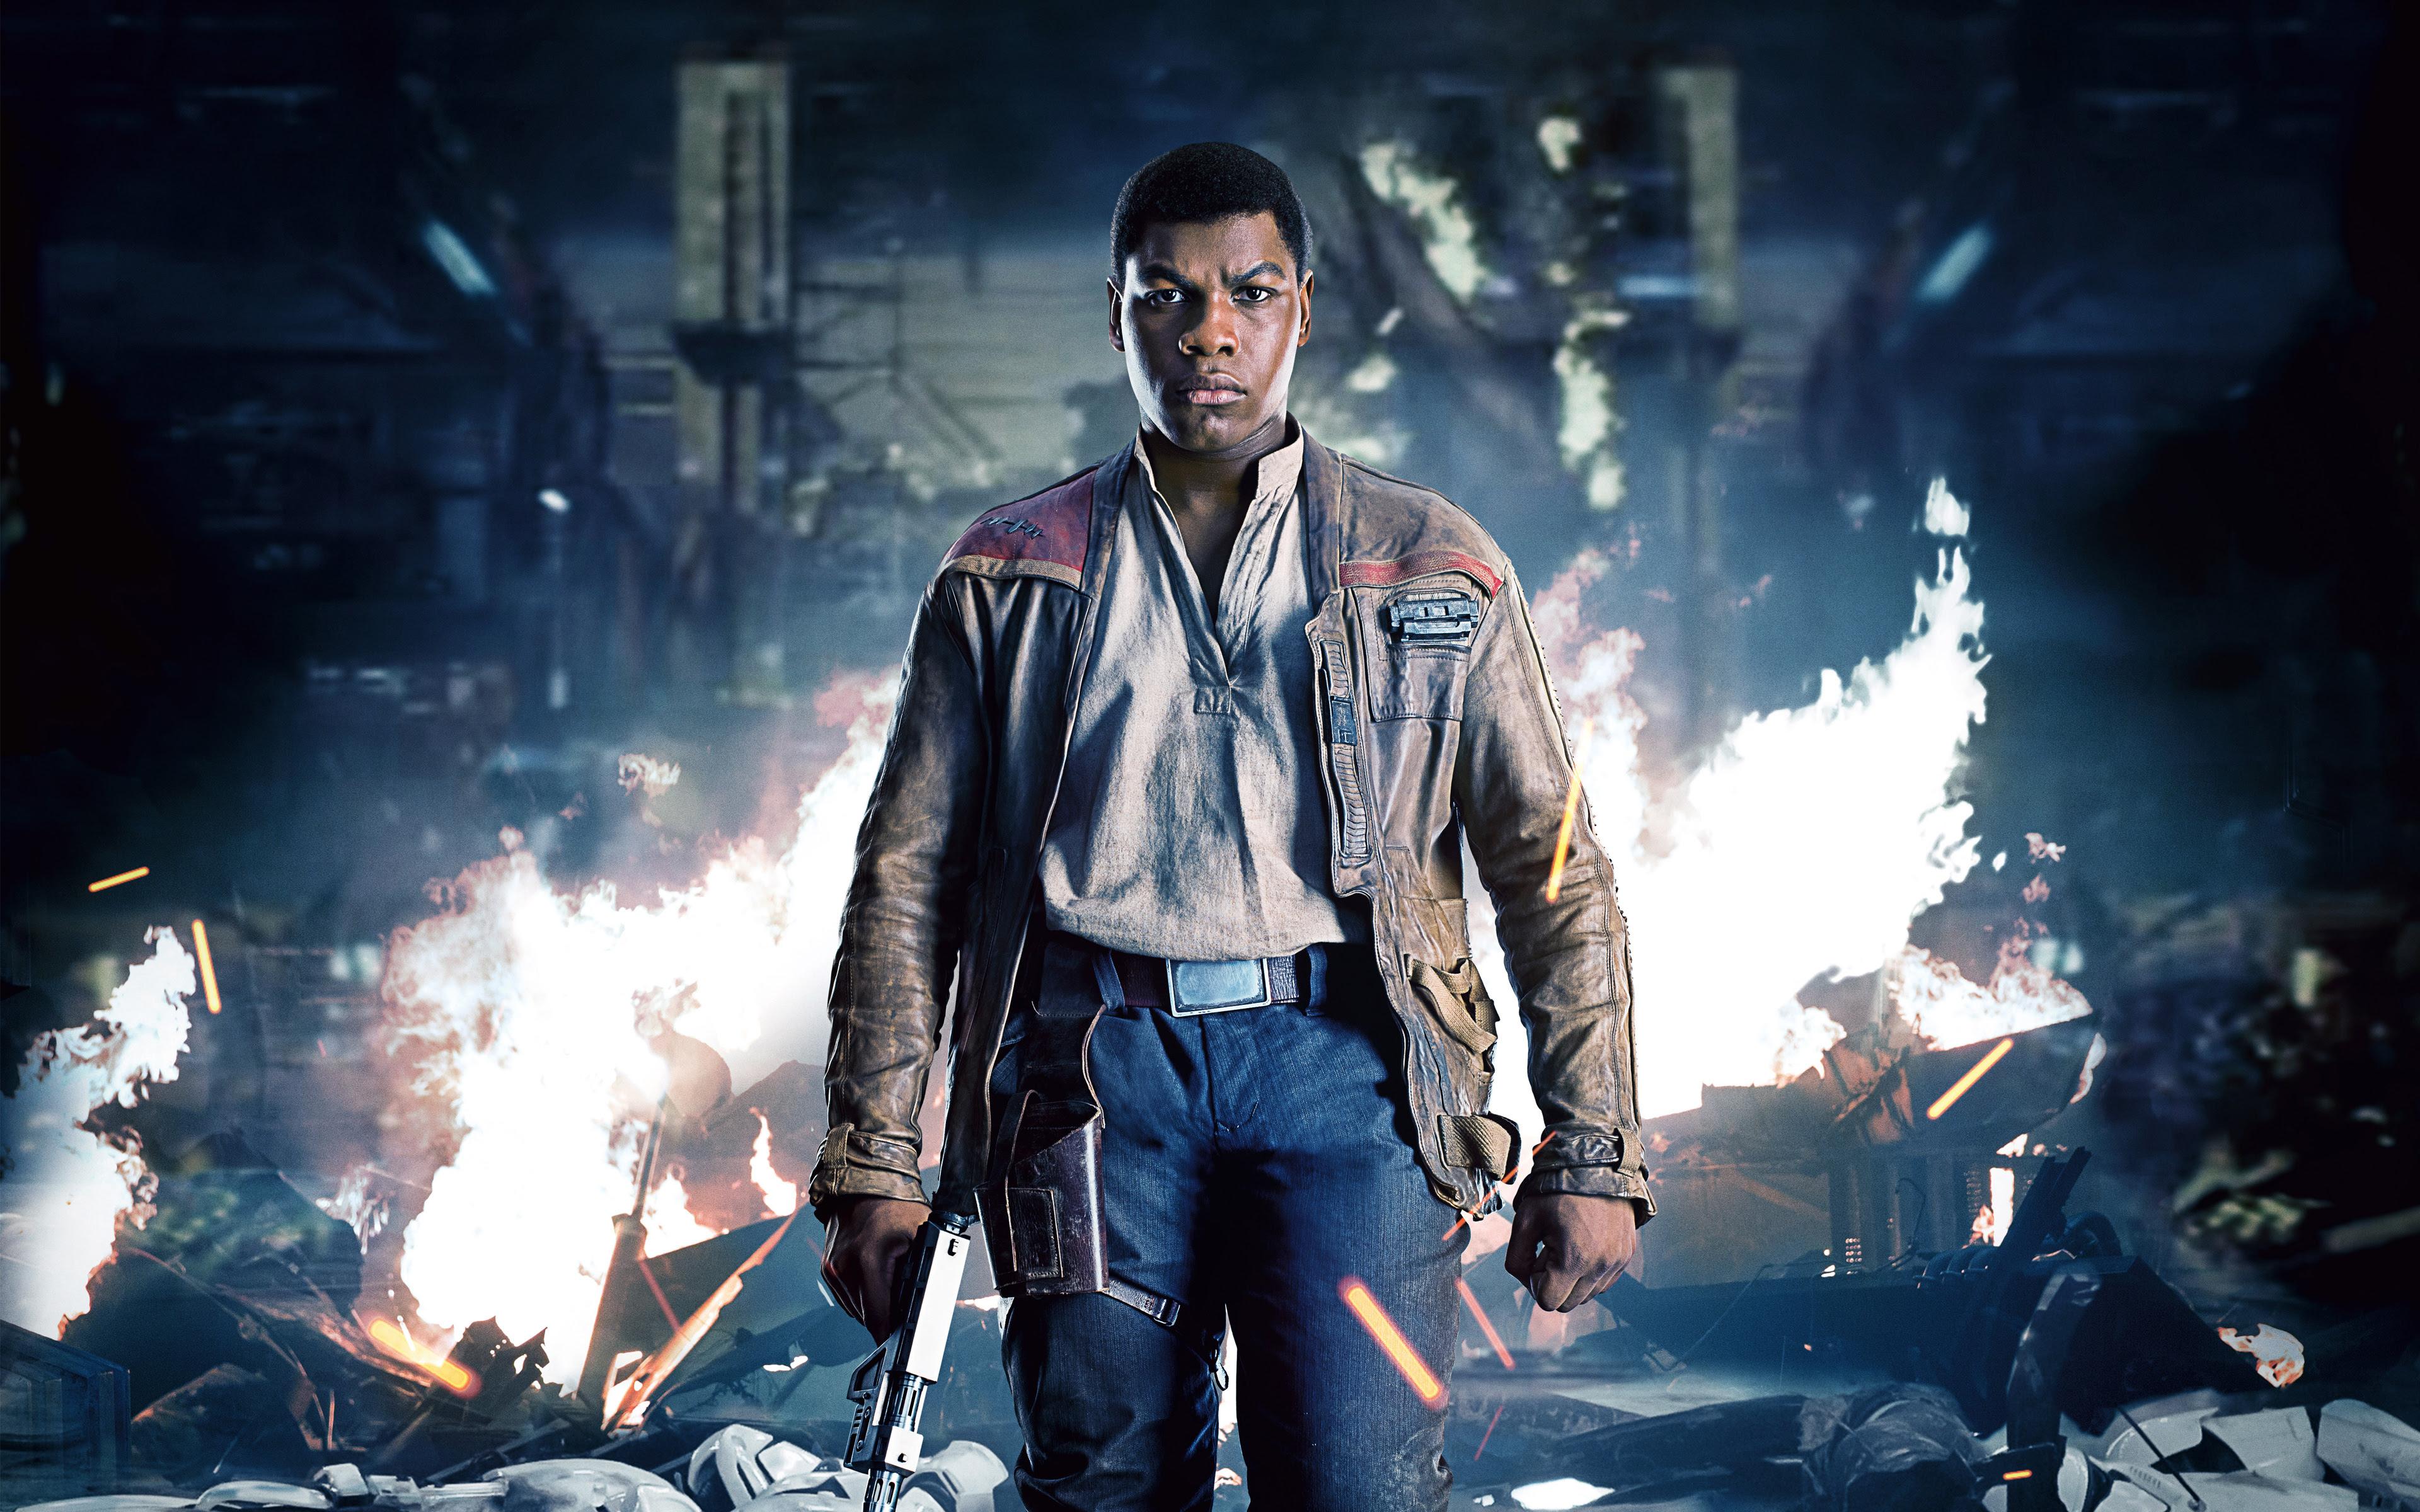 John Boyega As Finn Star Wars The Last Jedi 4k Wallpapers Hd